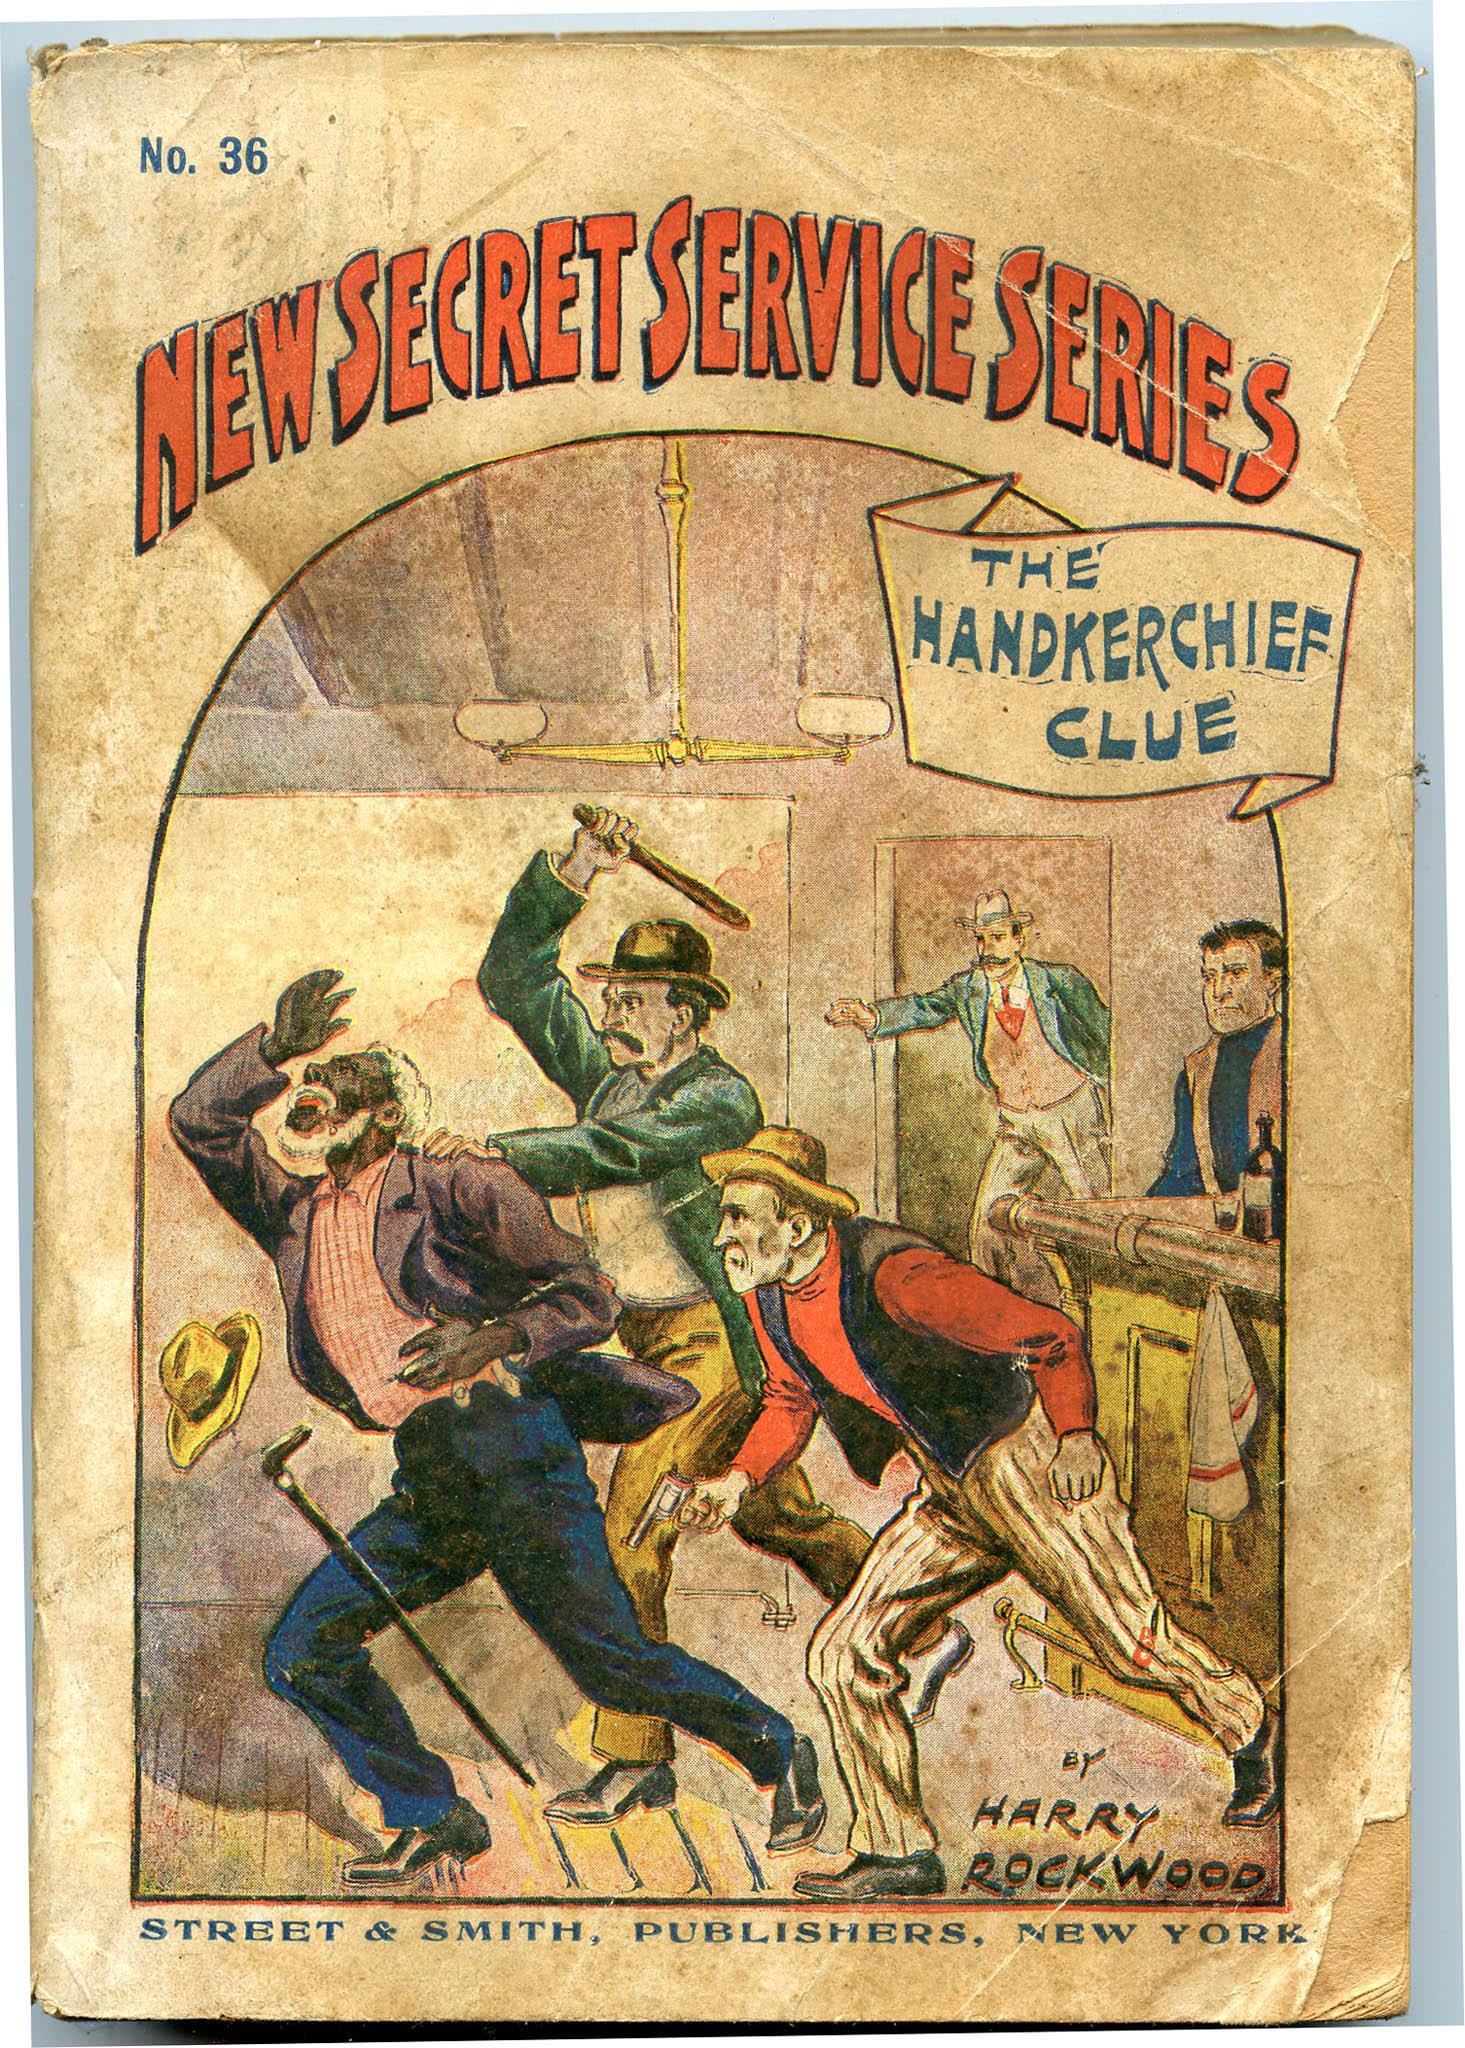 The Handkerchief Clue